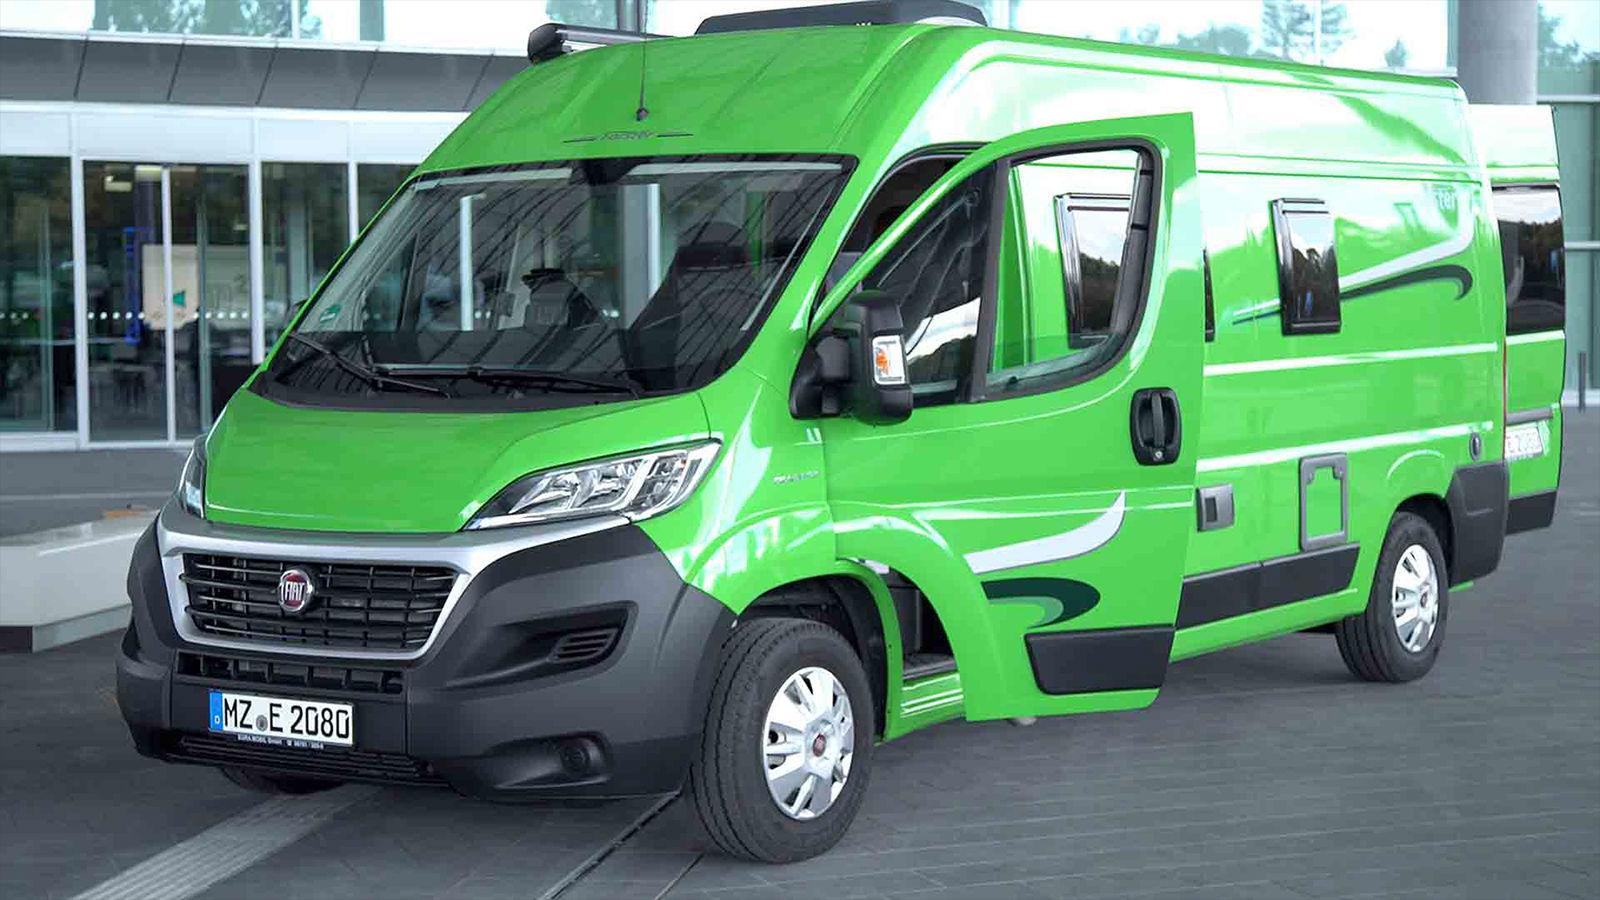 Caravan Salon (2020): Messe - Reisen - Wohnmobil - Info ...